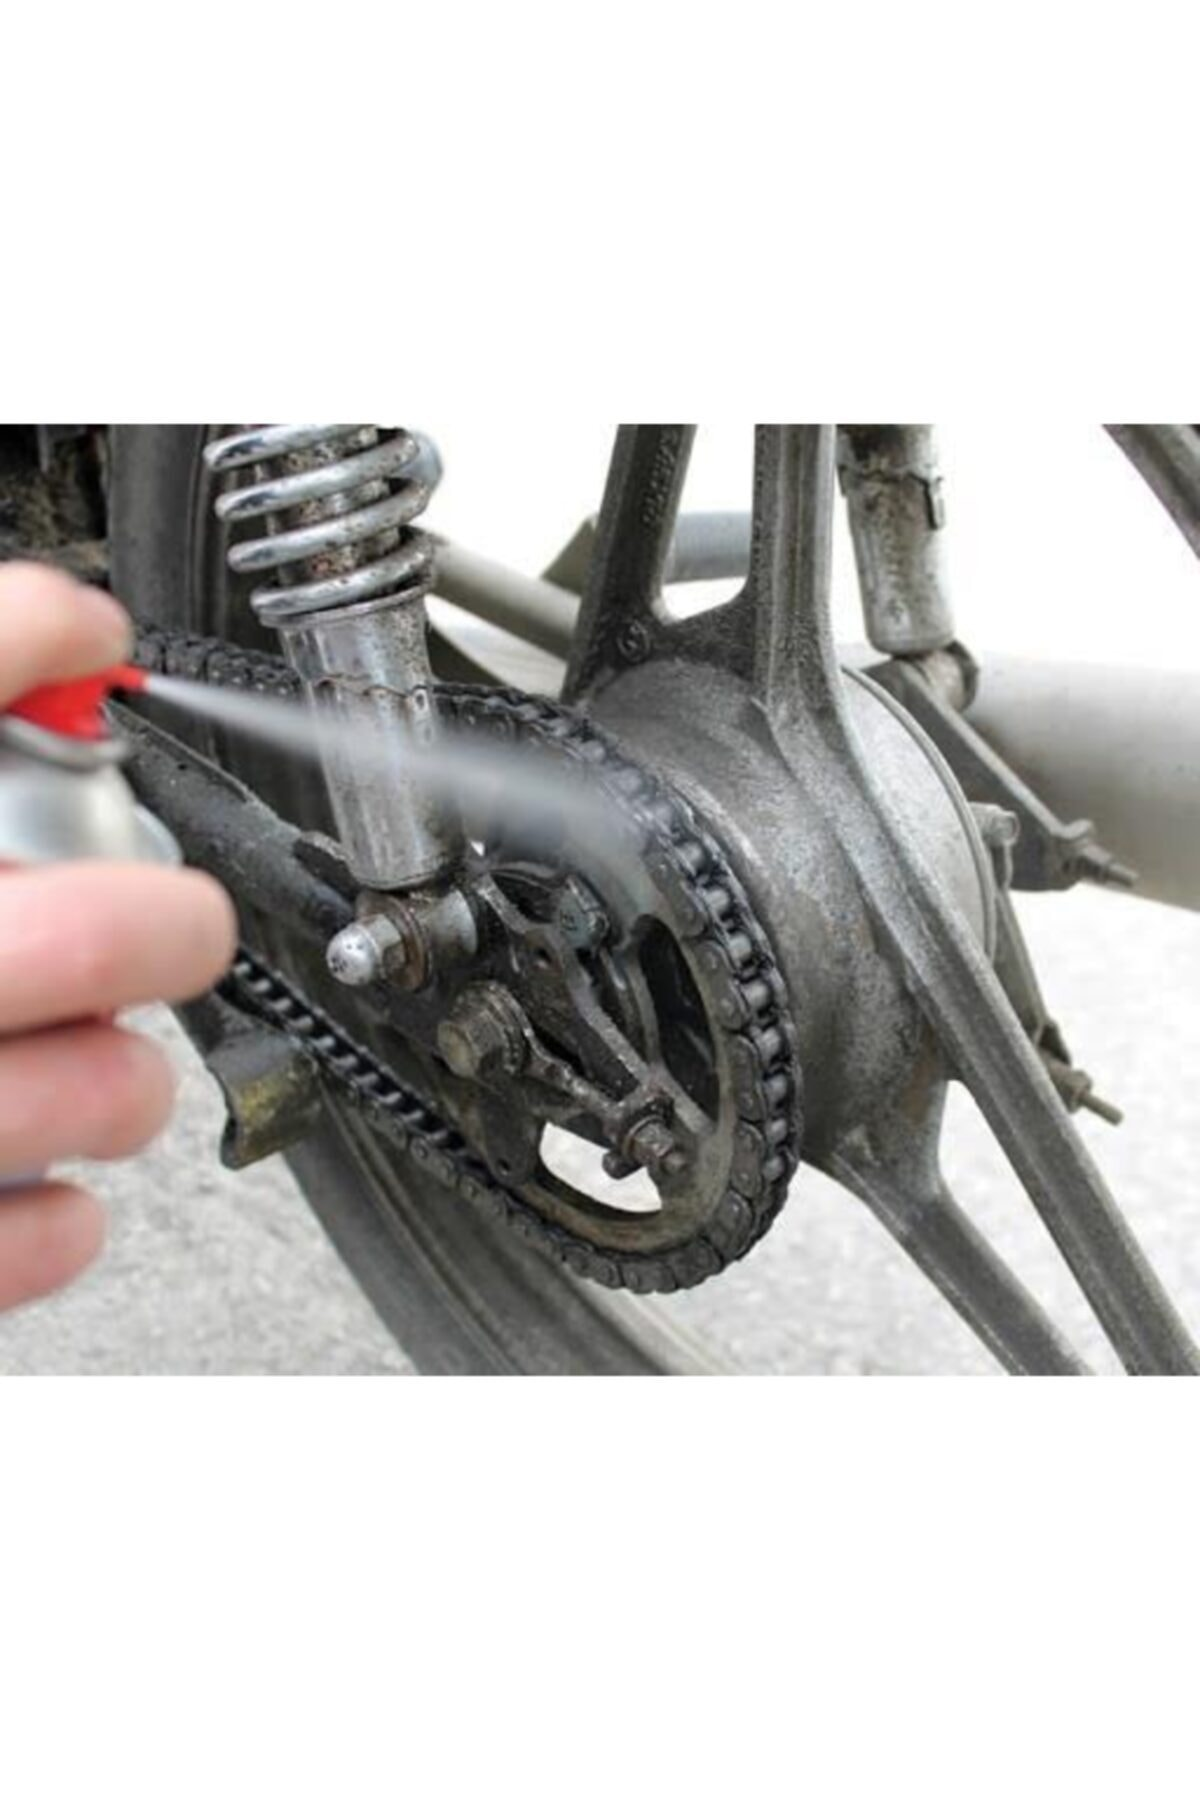 MxS Bisiklet Zincir Yağı (kararmaz Yapmaz; Yapışma Olmaz) 400 Ml 2